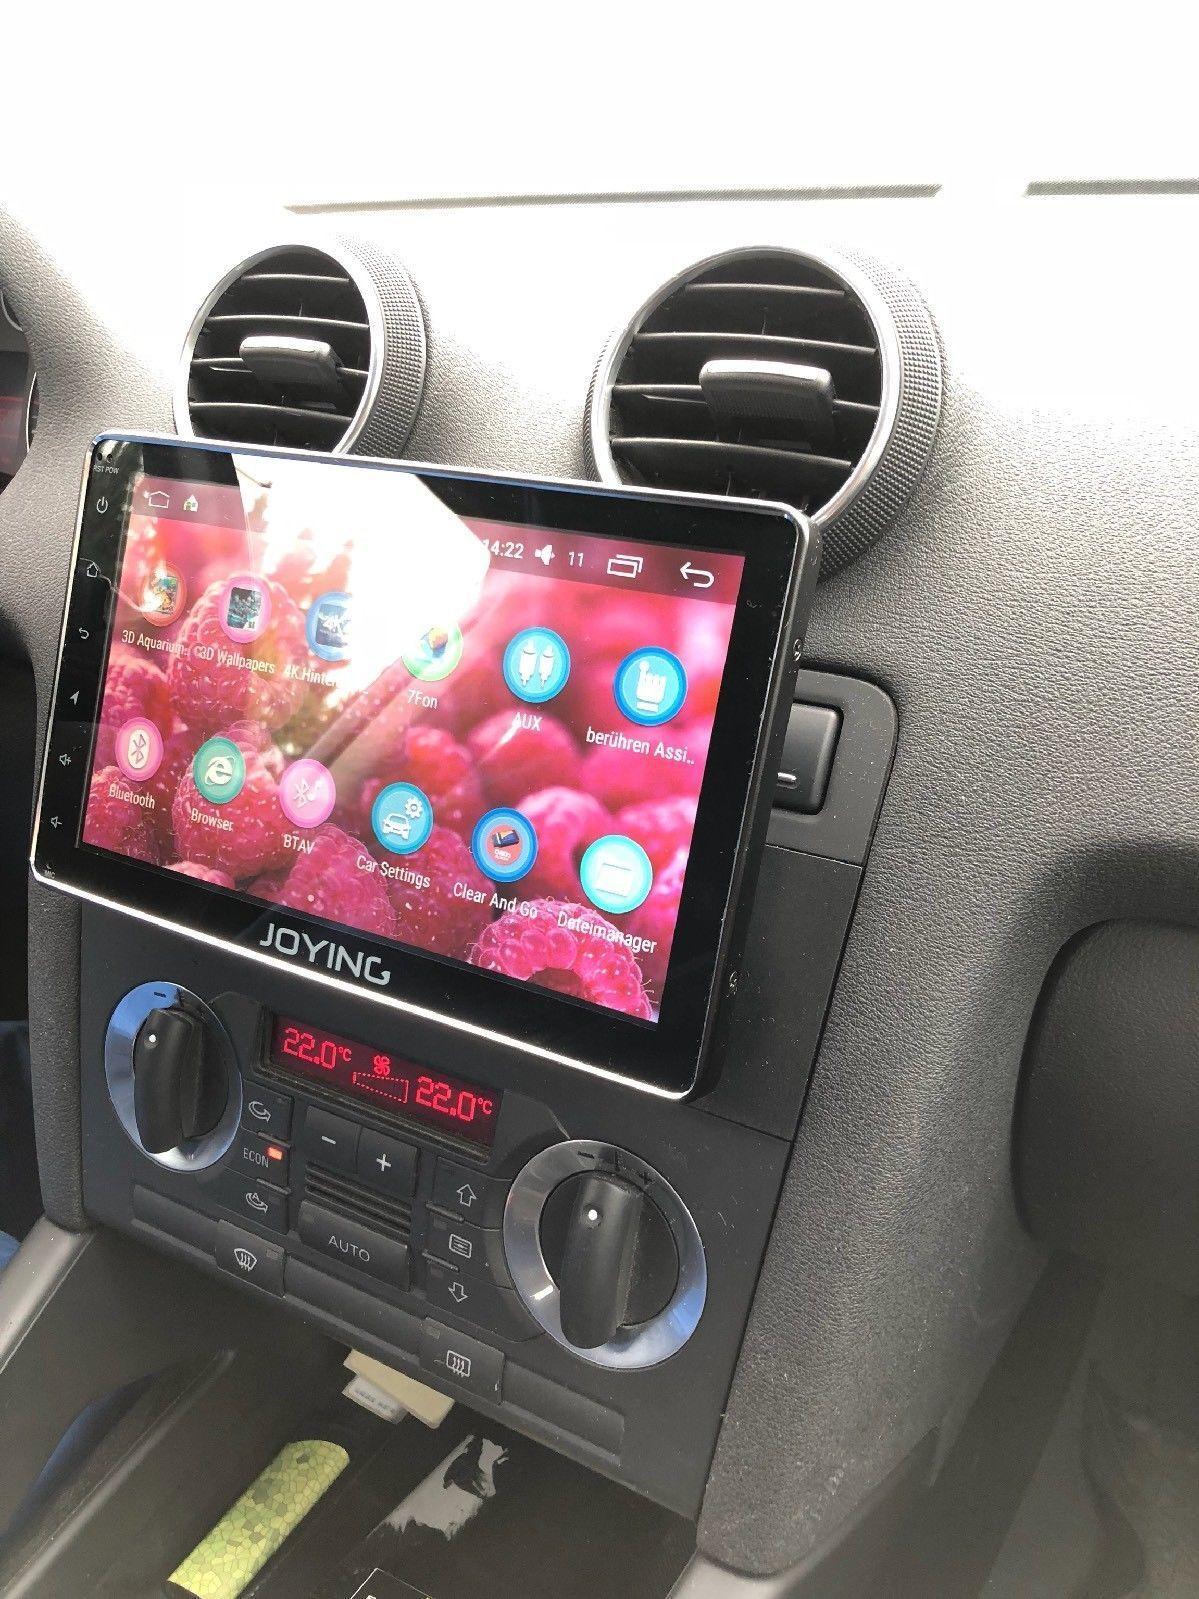 Audi a3 8p 2003 car usb car stereo multimedia